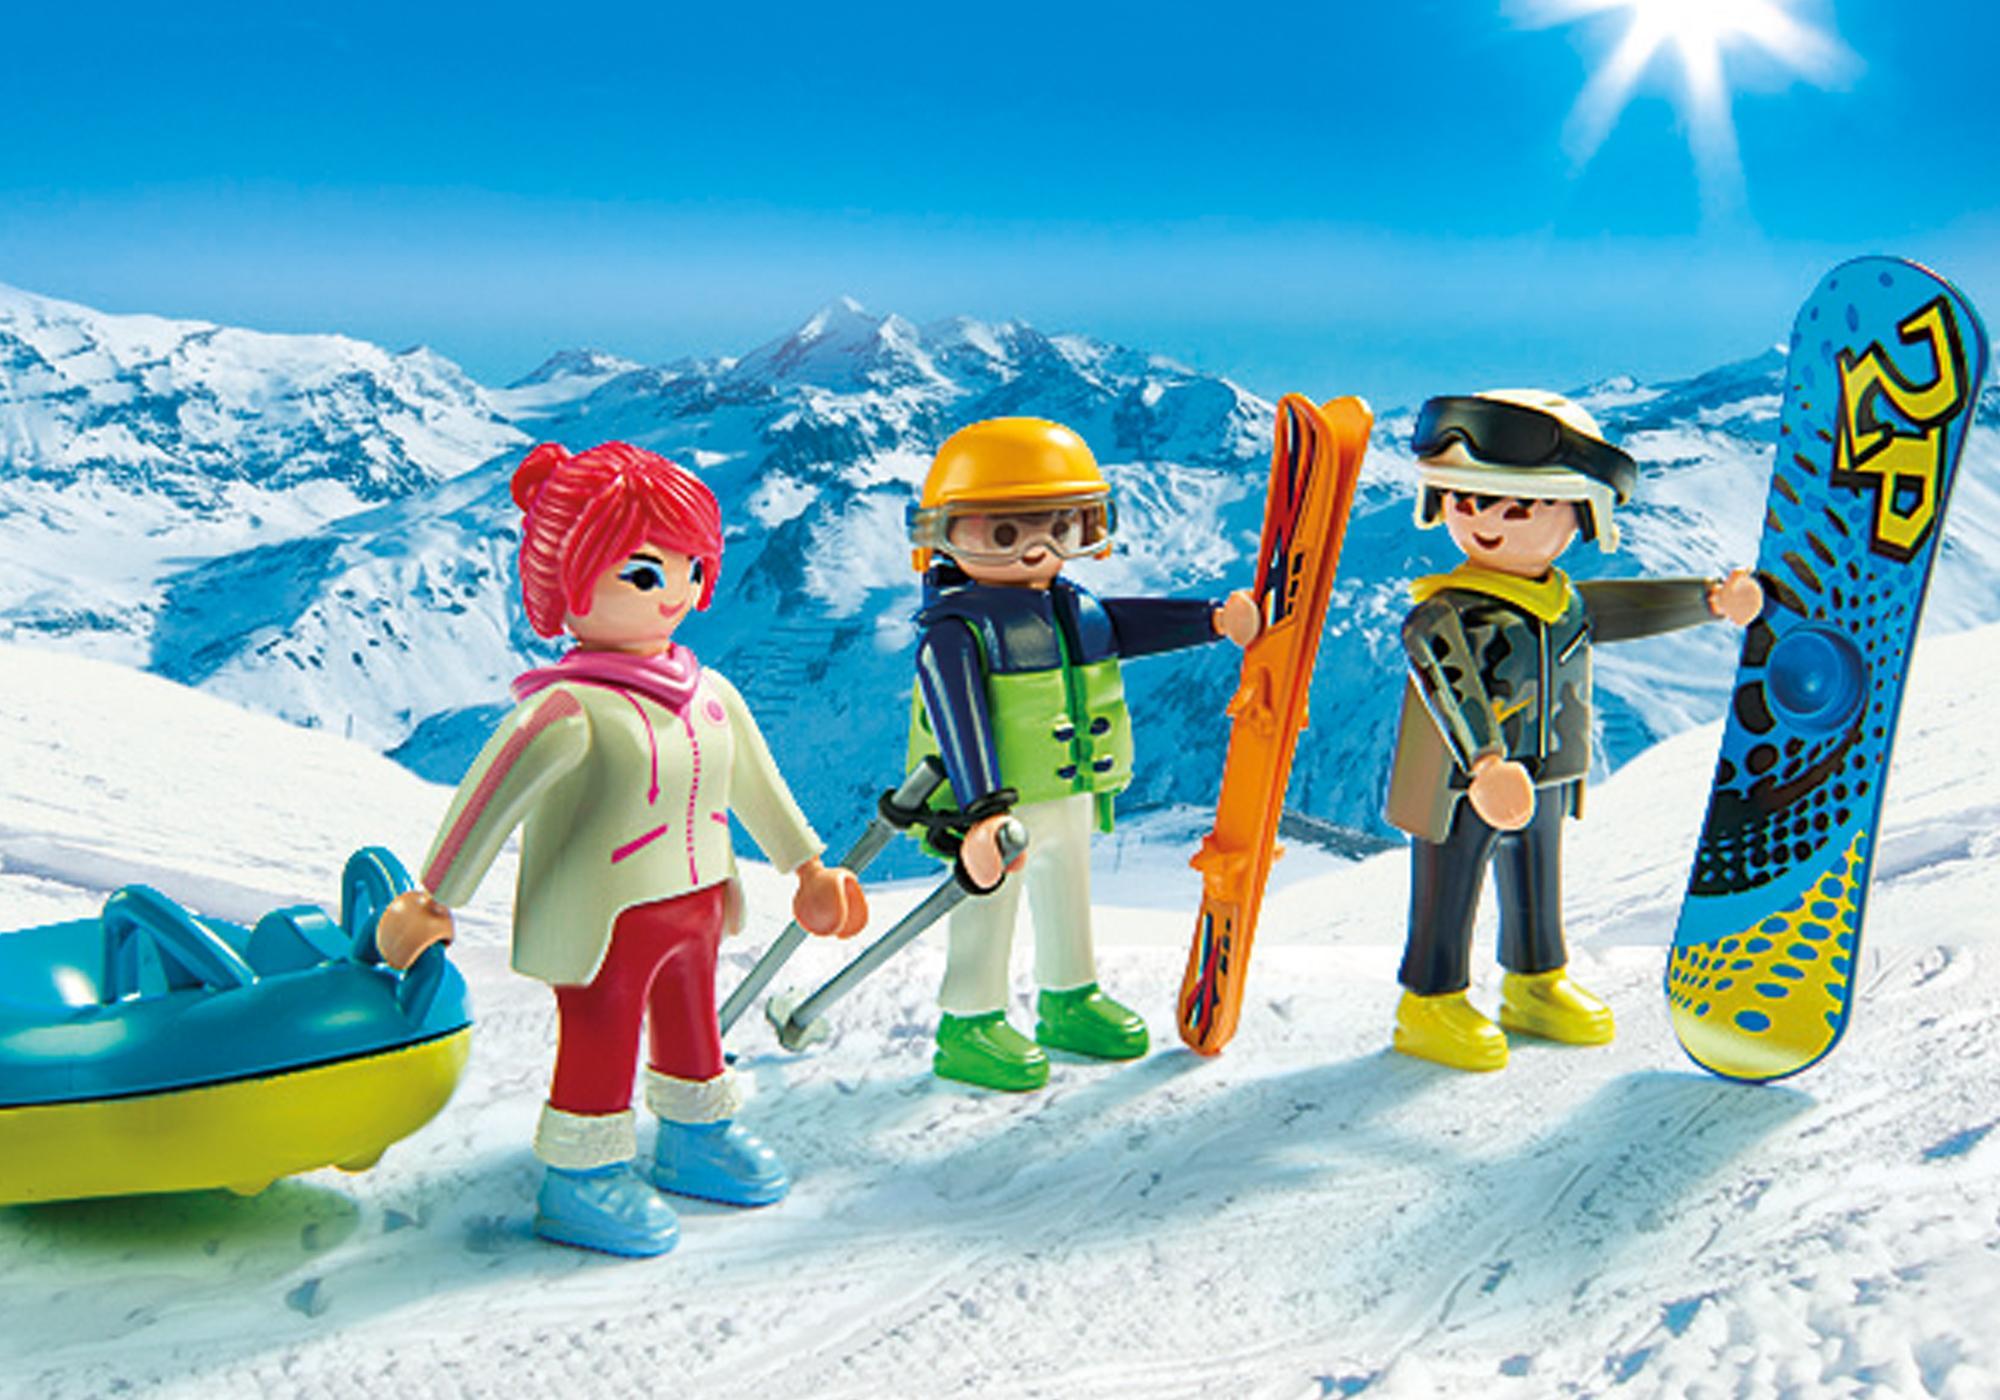 http://media.playmobil.com/i/playmobil/9286_product_extra1/Winter Sports Trio